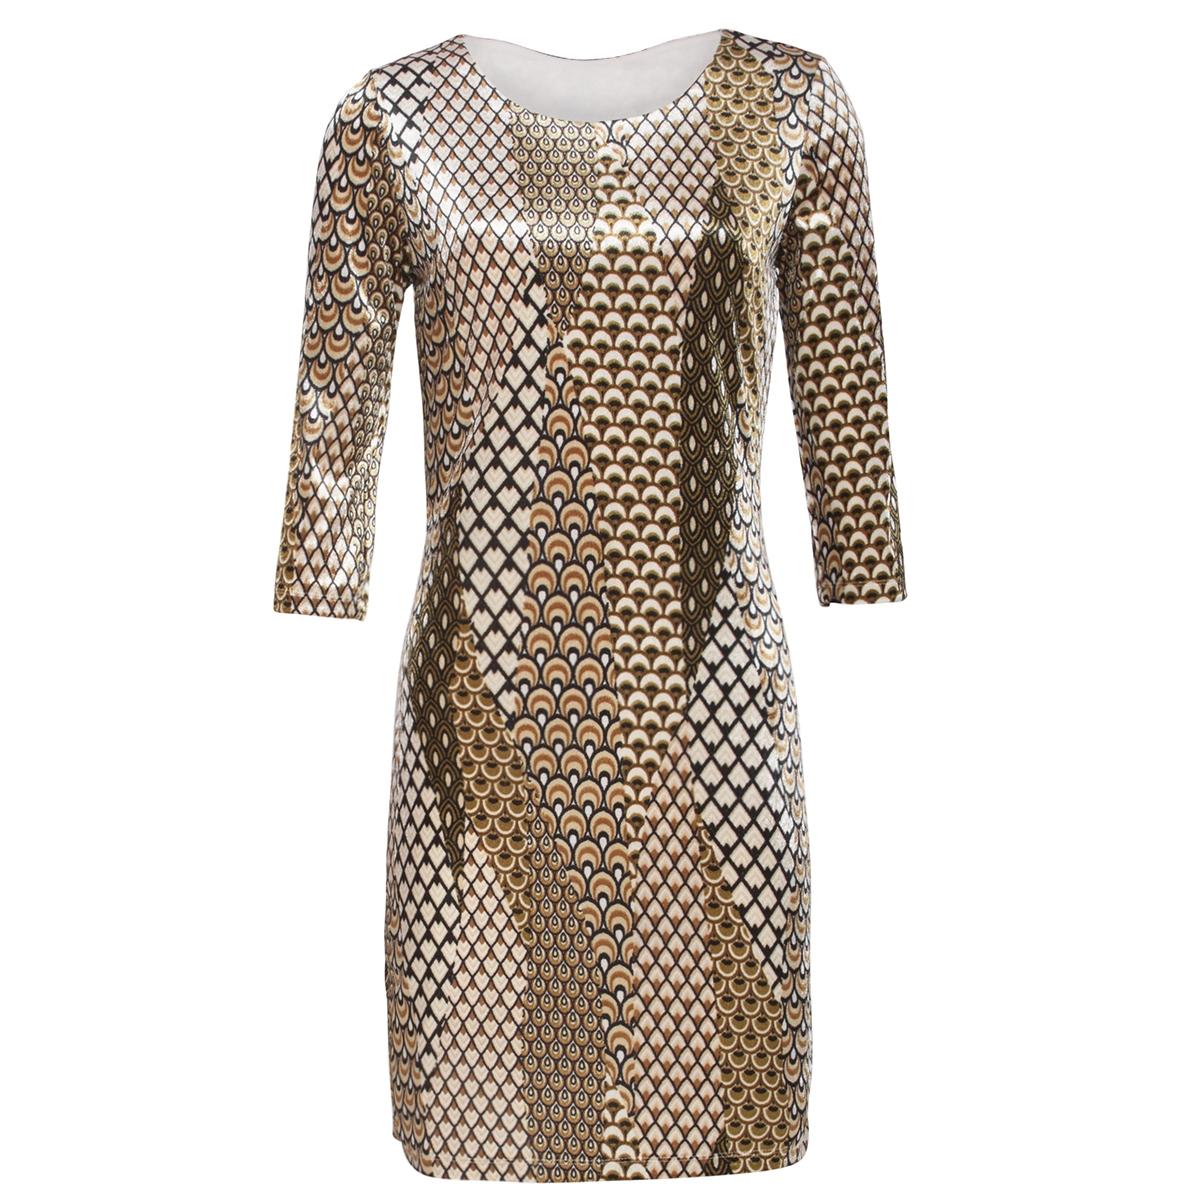 dress 19854 smashed lemon jurk 025/999